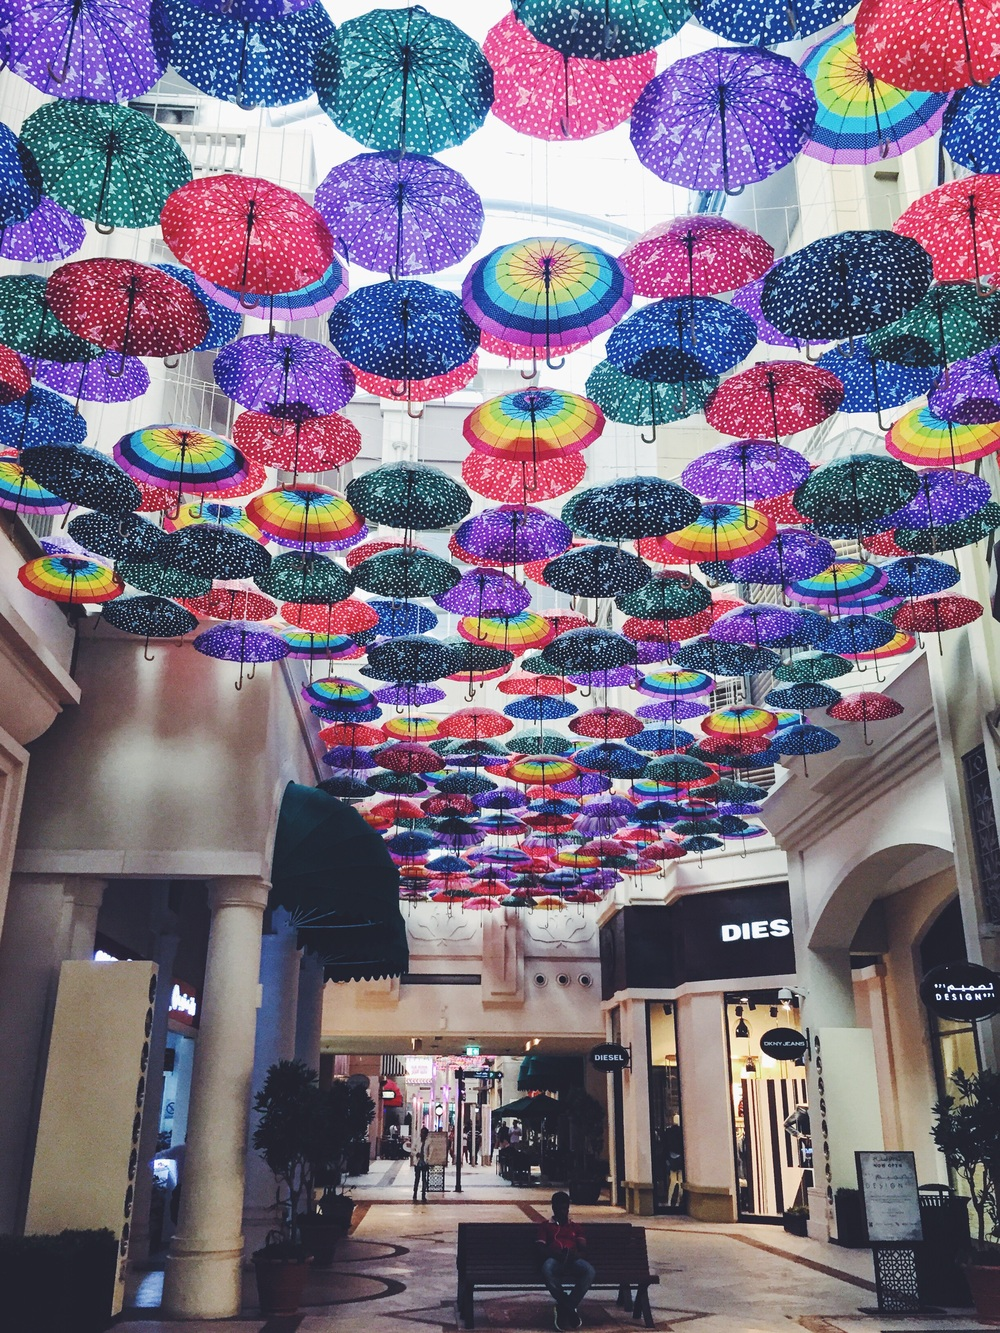 The Dubai Mall.